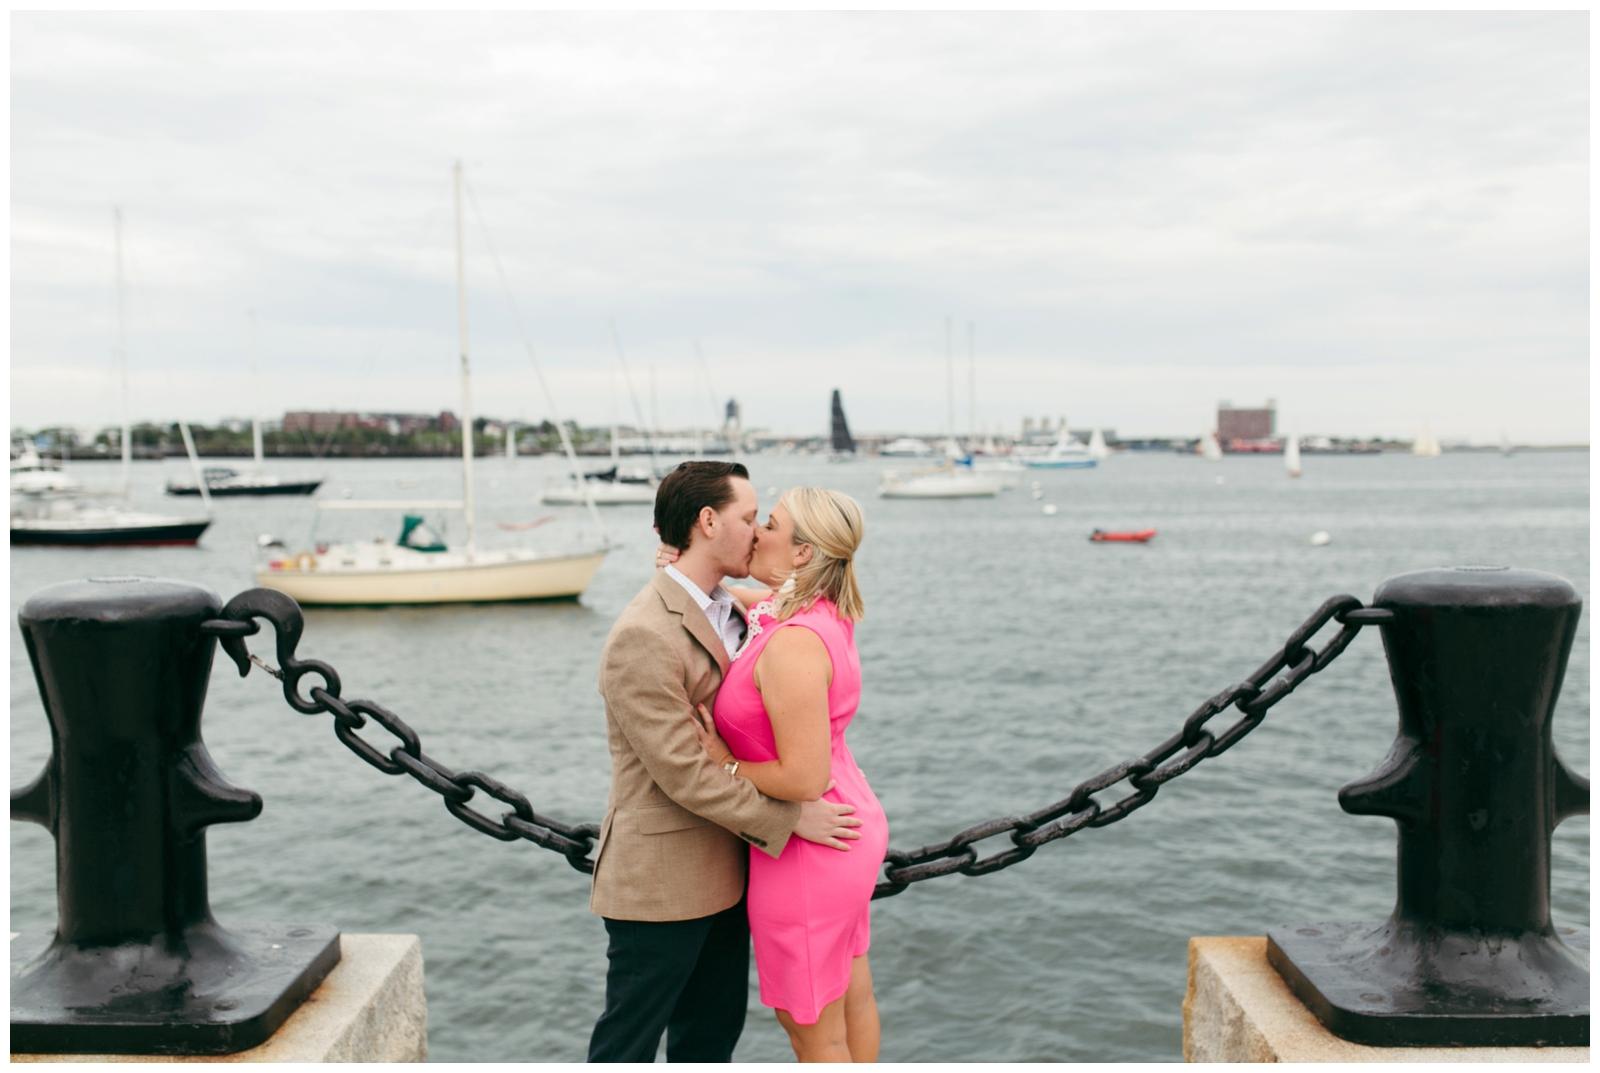 Bailey-Q-Photo-Boston-Seaport-Proposal-Boston-Wedding-Photographer-001.jpg